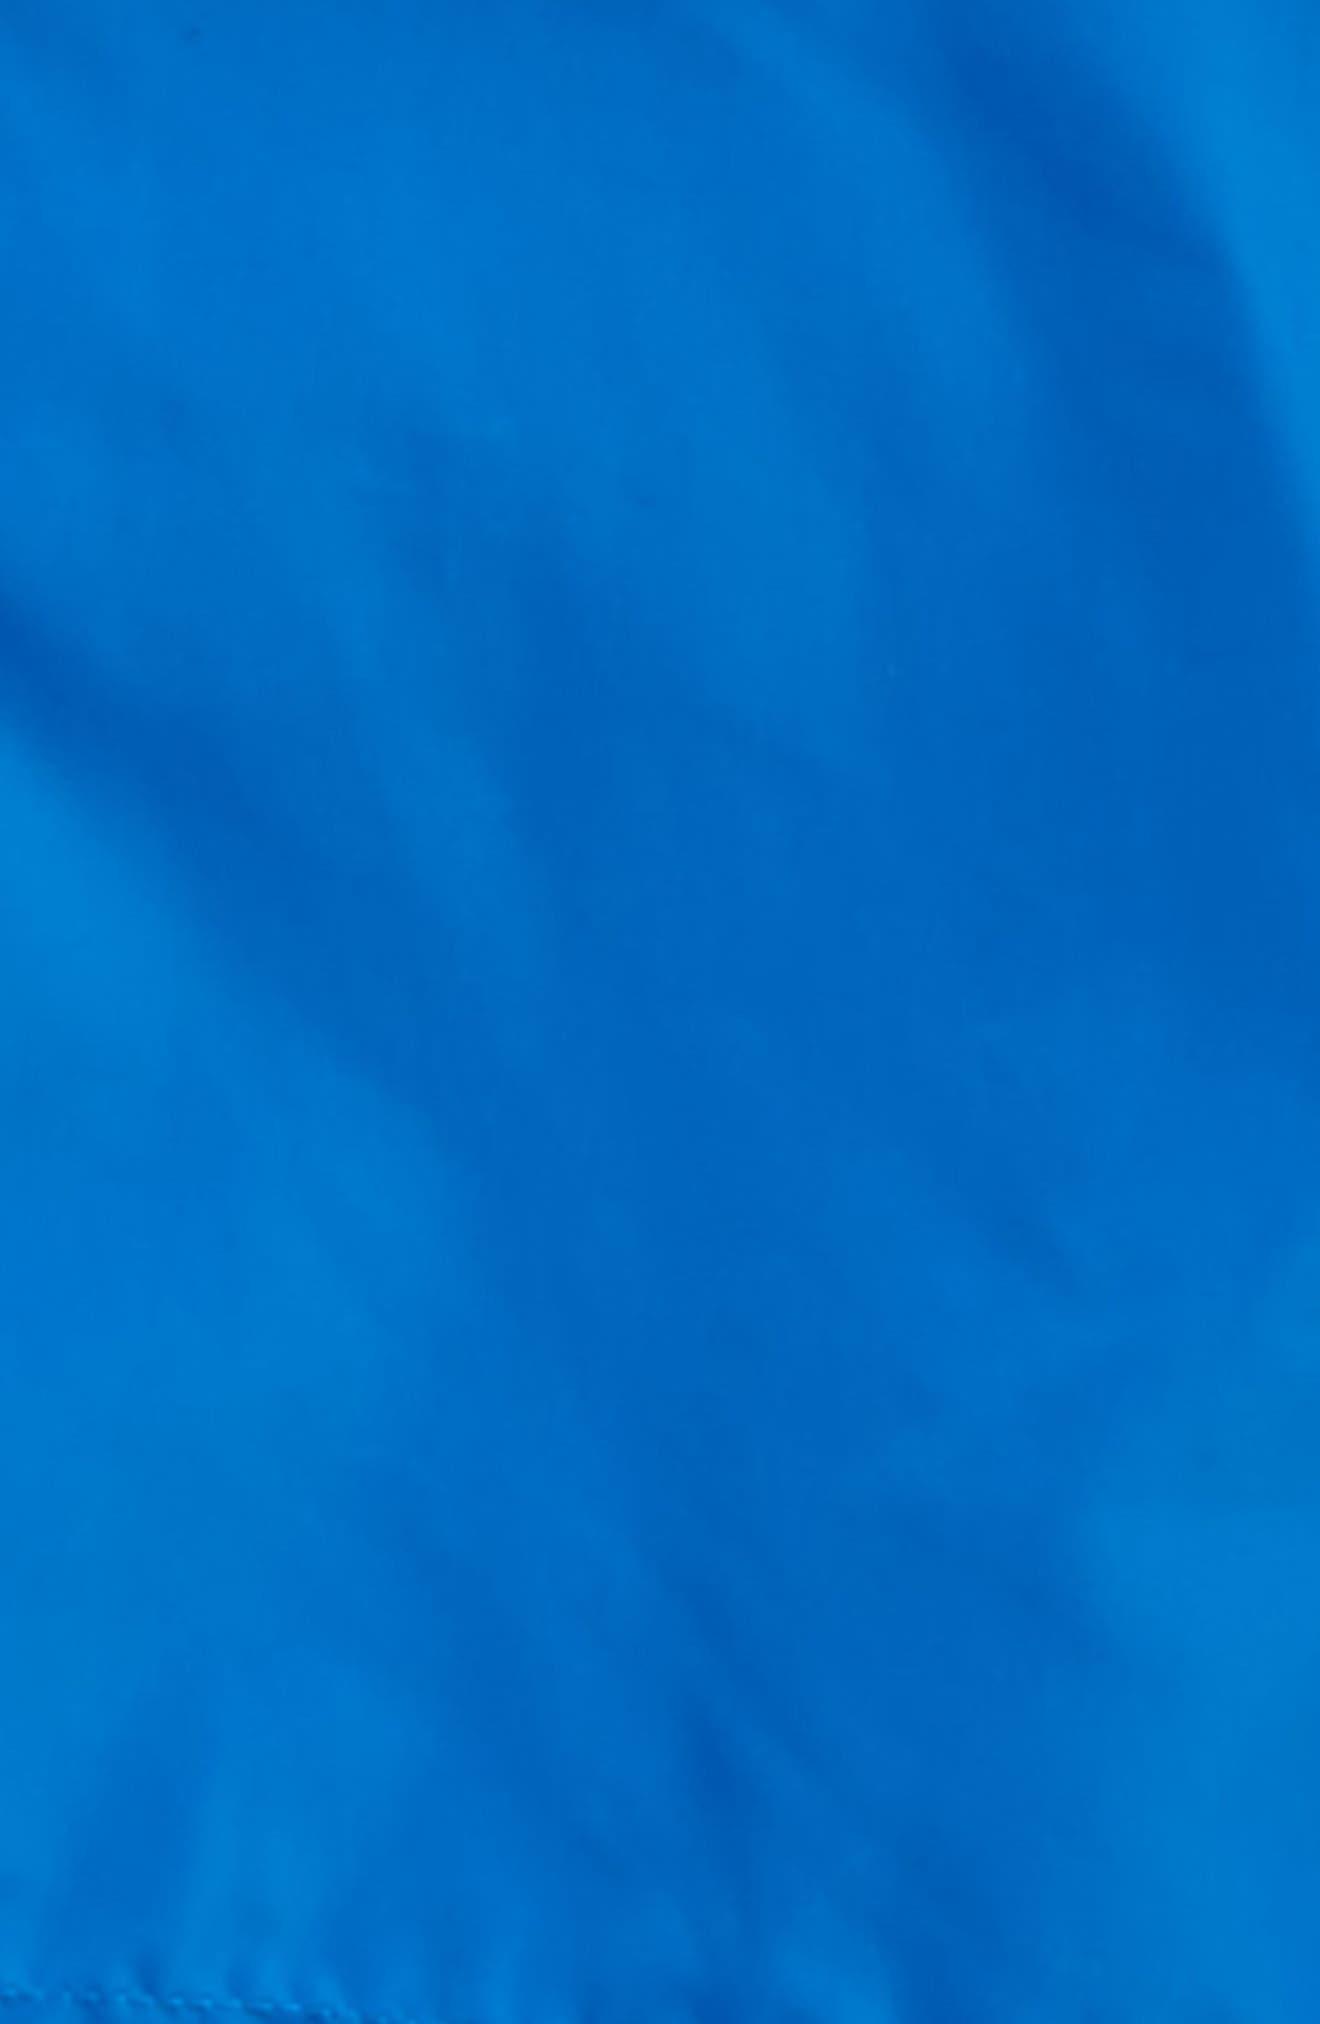 Yately Waterproof Field Jacket,                             Alternate thumbnail 2, color,                             420